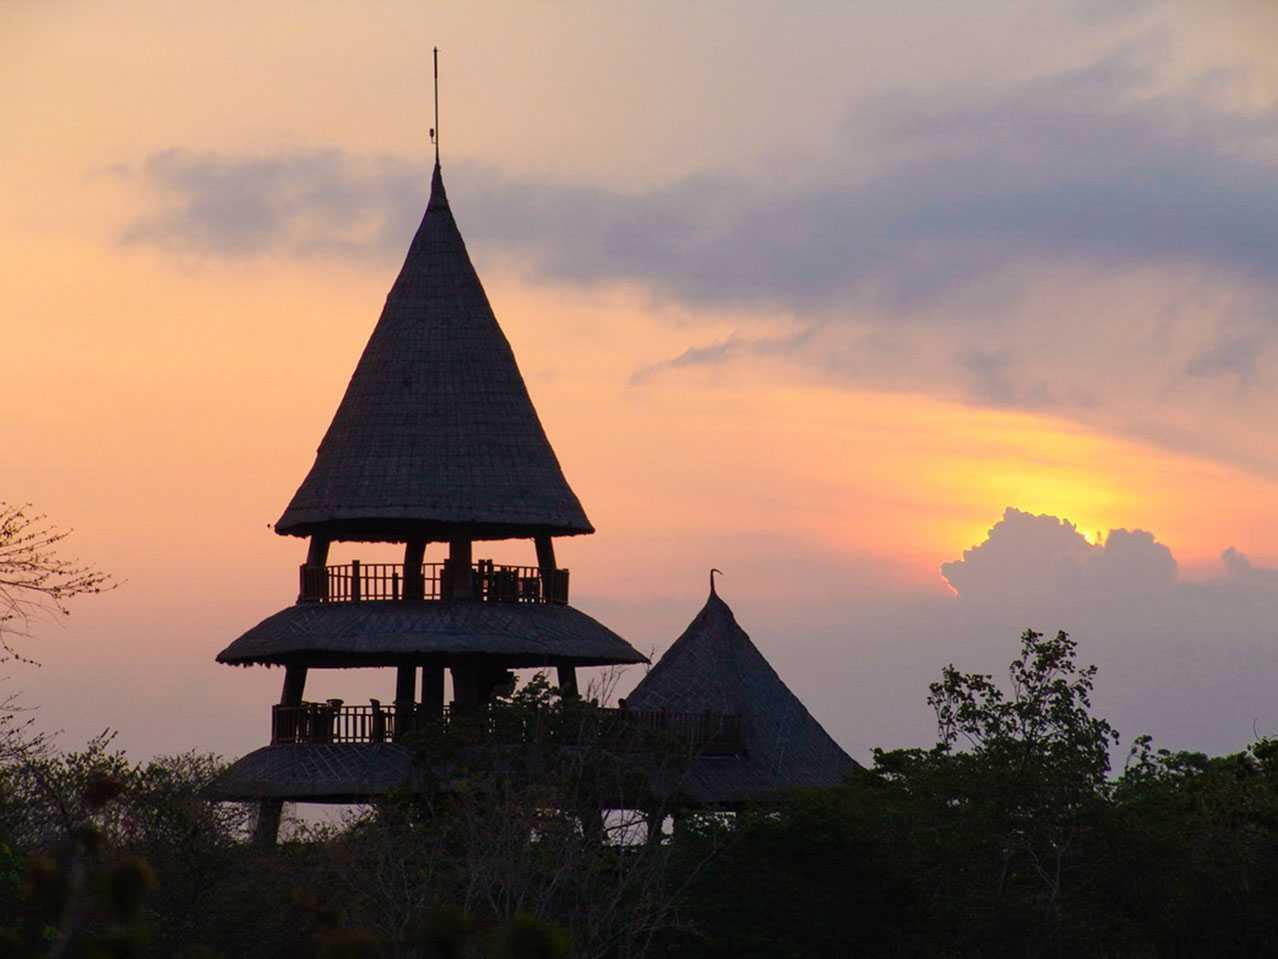 Insada Integrated Design Team Menjangan Resort West Bali National Park, Jl. Raya Seririt – Gilimanuk, Gerokgak, Pejarakan, Gerokgak, Buleleng Regency, Bali 81155, Indonesia West Bali National Park, Jl. Raya Seririt – Gilimanuk, Gerokgak, Pejarakan, Gerokgak, Buleleng Regency, Bali 81155, Indonesia Insada-Integrated-Design-Team-Menjangan-Resort  72715